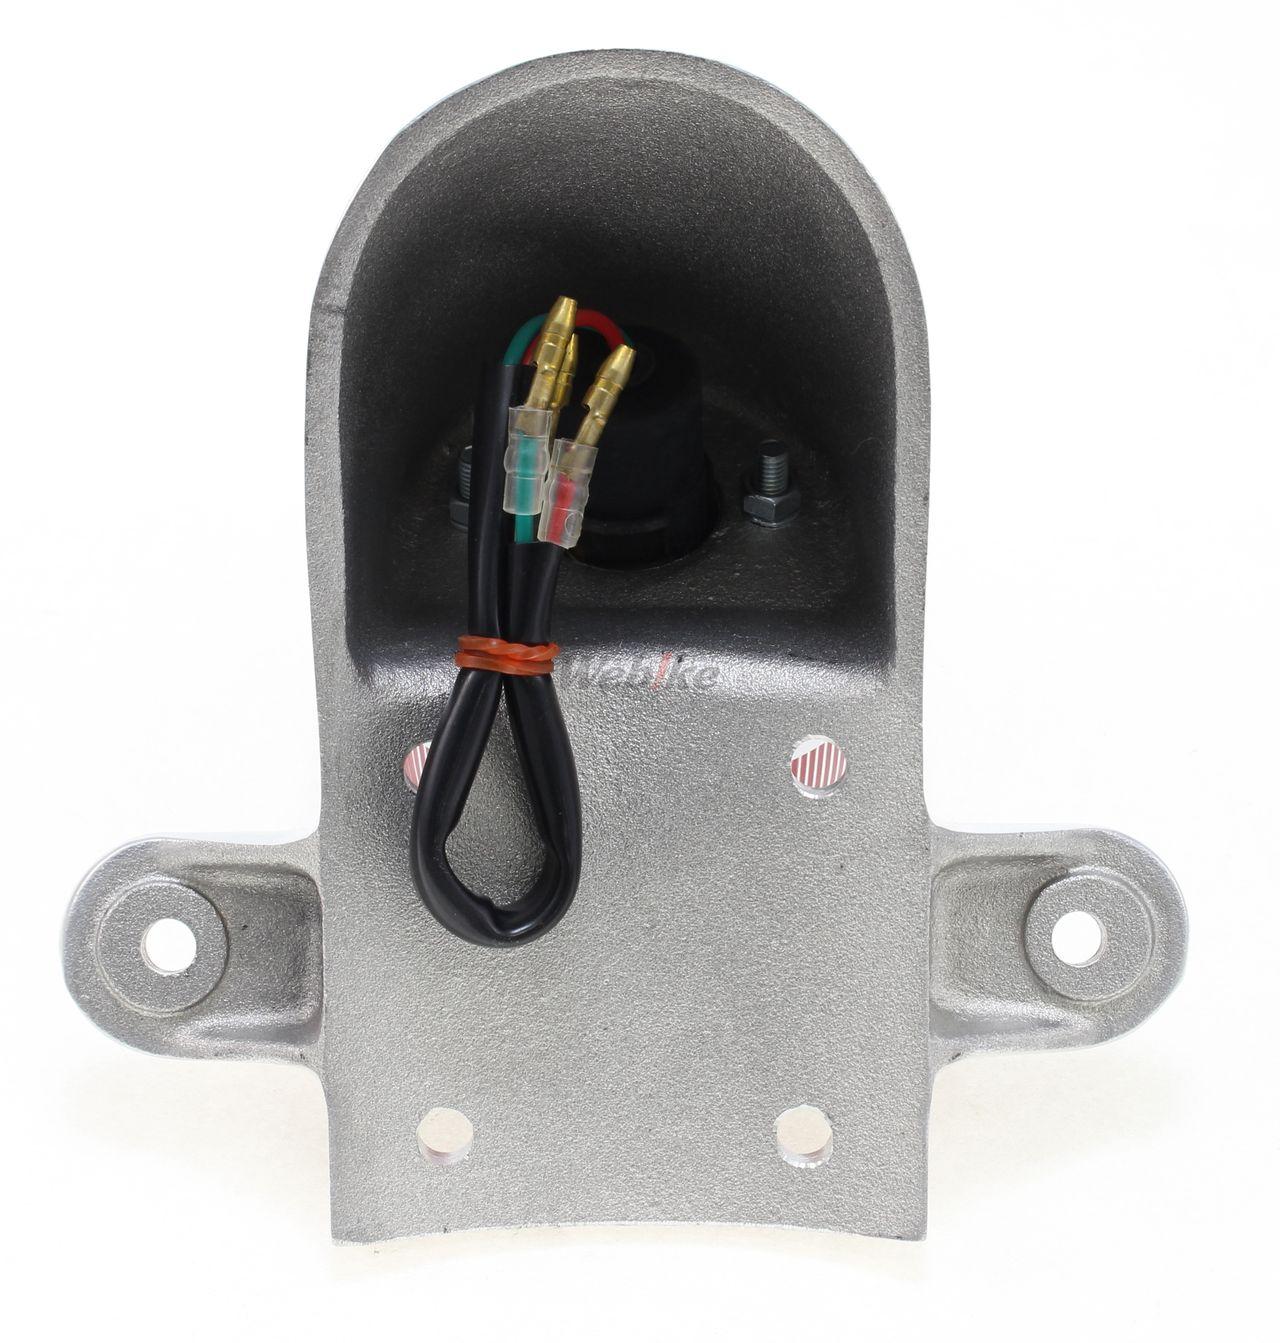 【POSH】圓形尾燈套件(土除需加工) - 「Webike-摩托百貨」